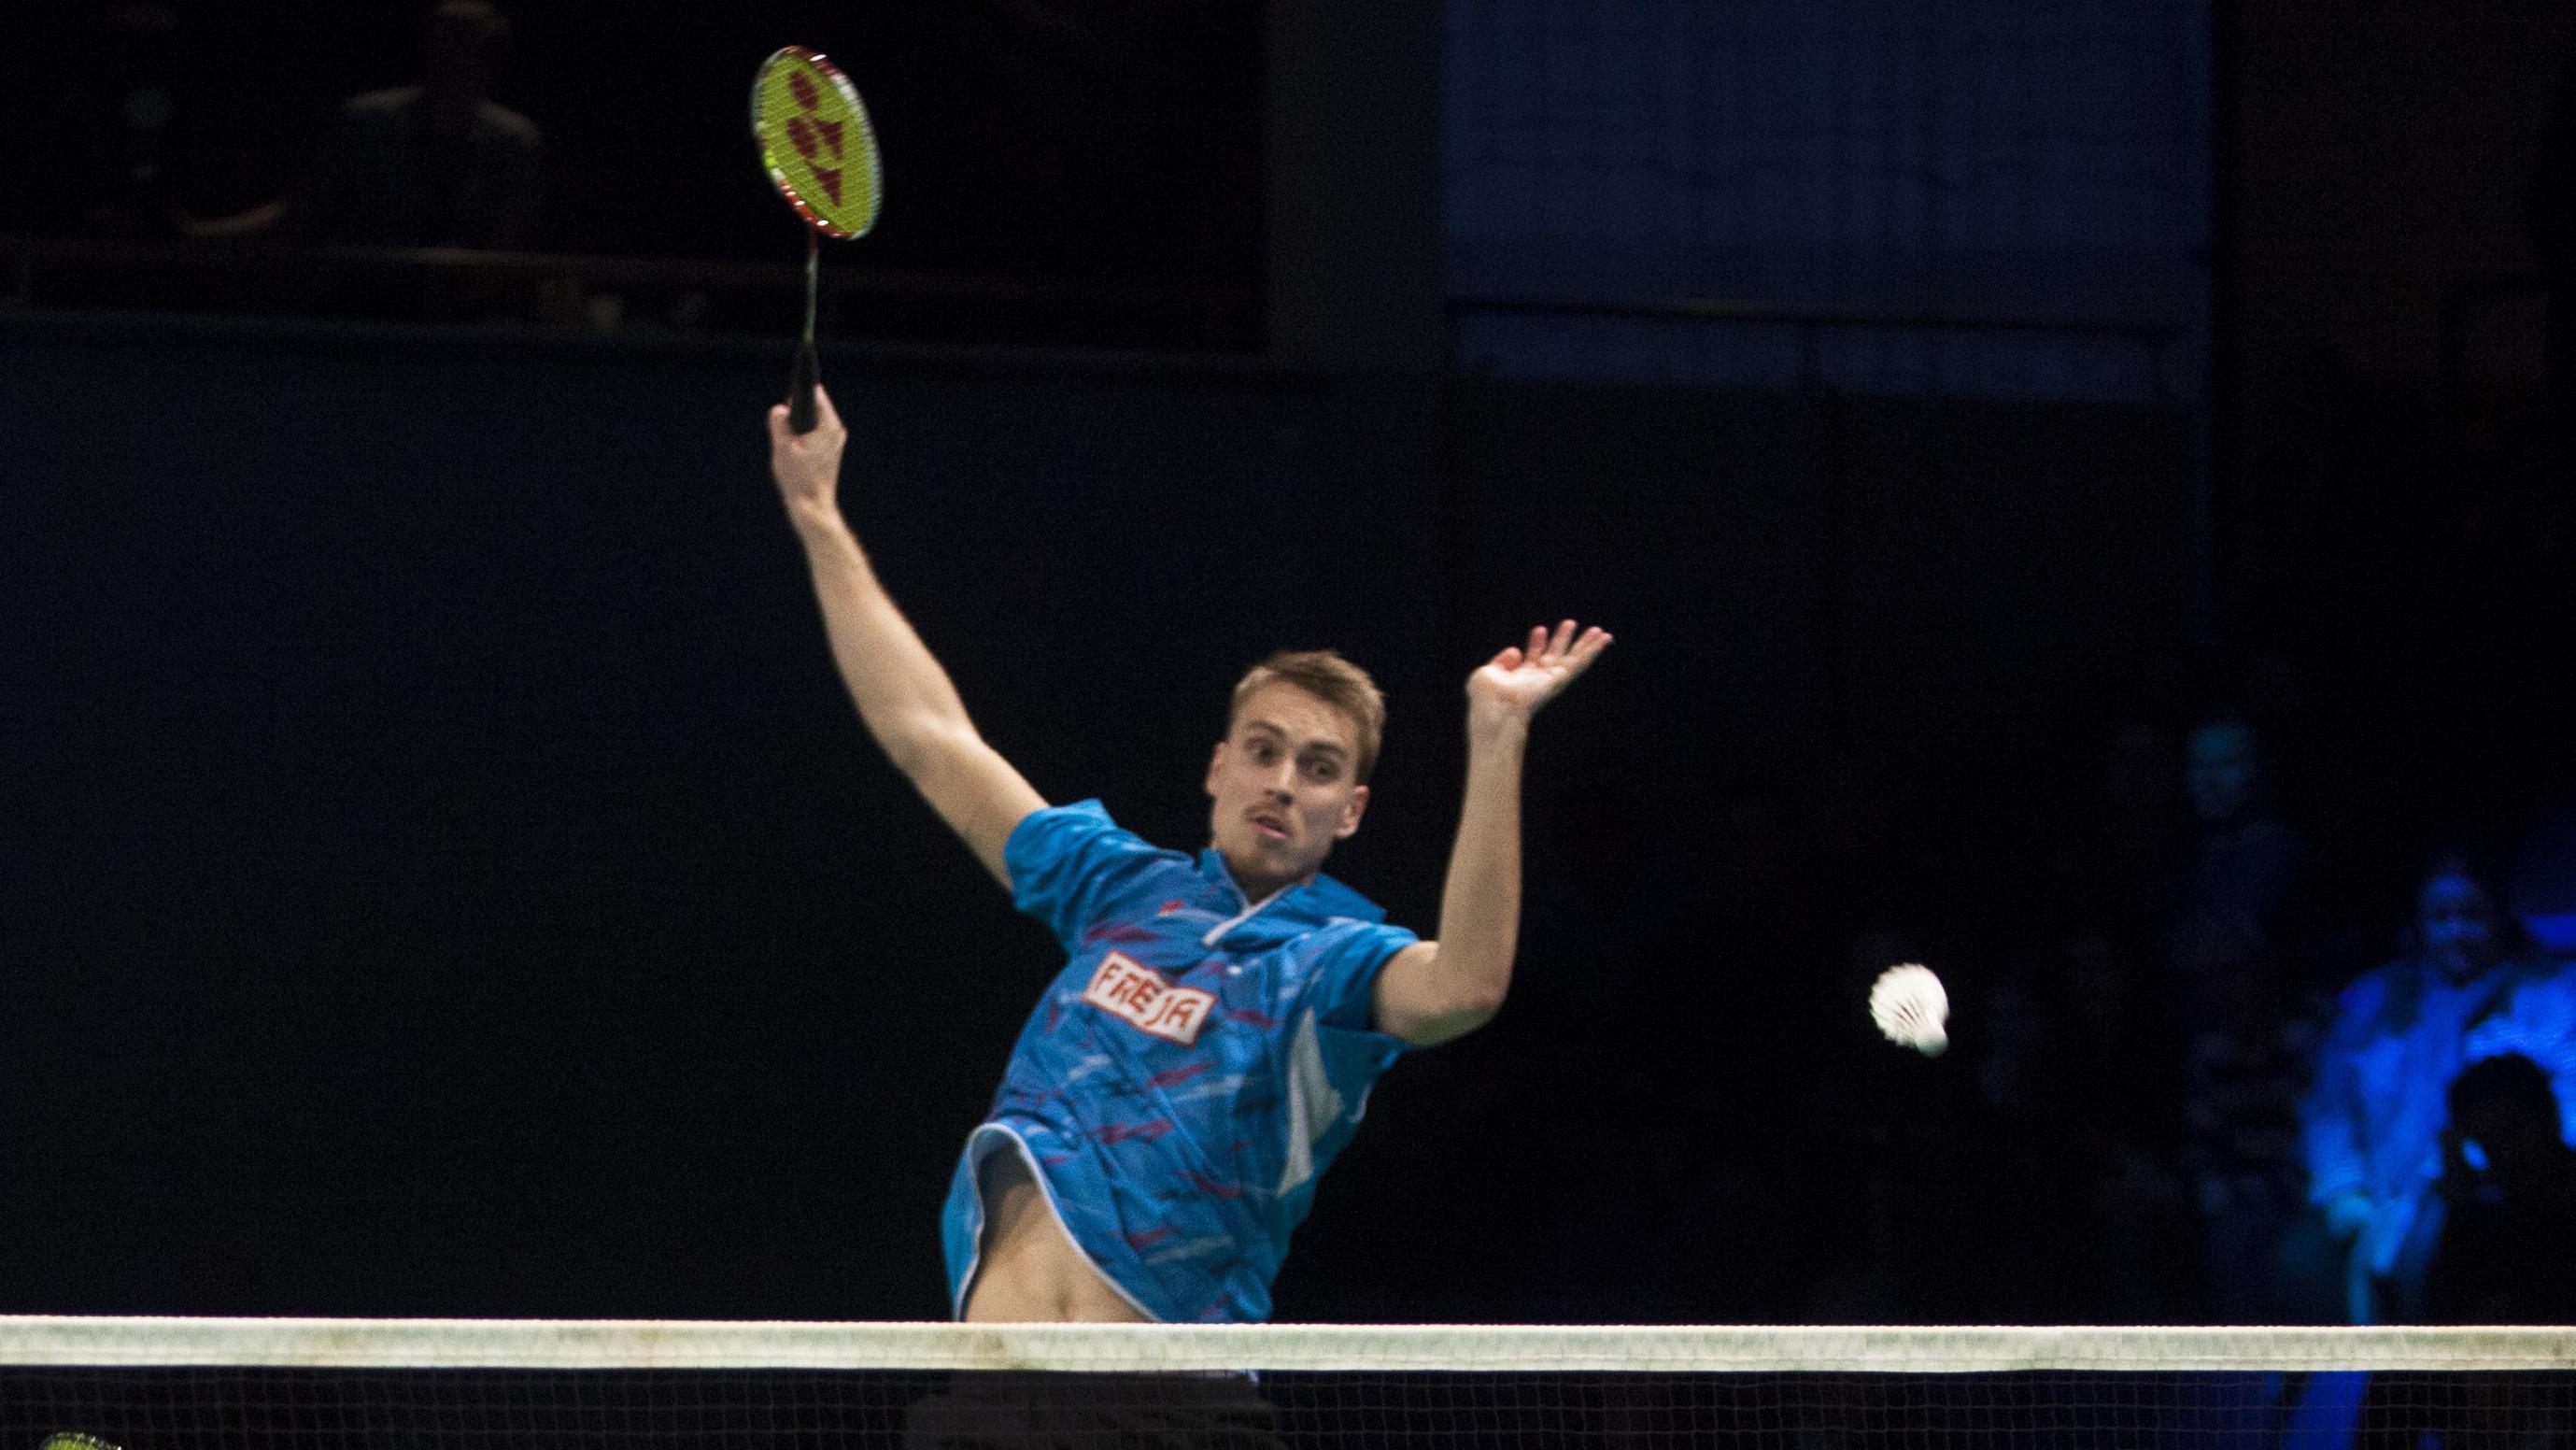 Mads Pieler Kolding laver verdens h¥rdeste smash Badminton